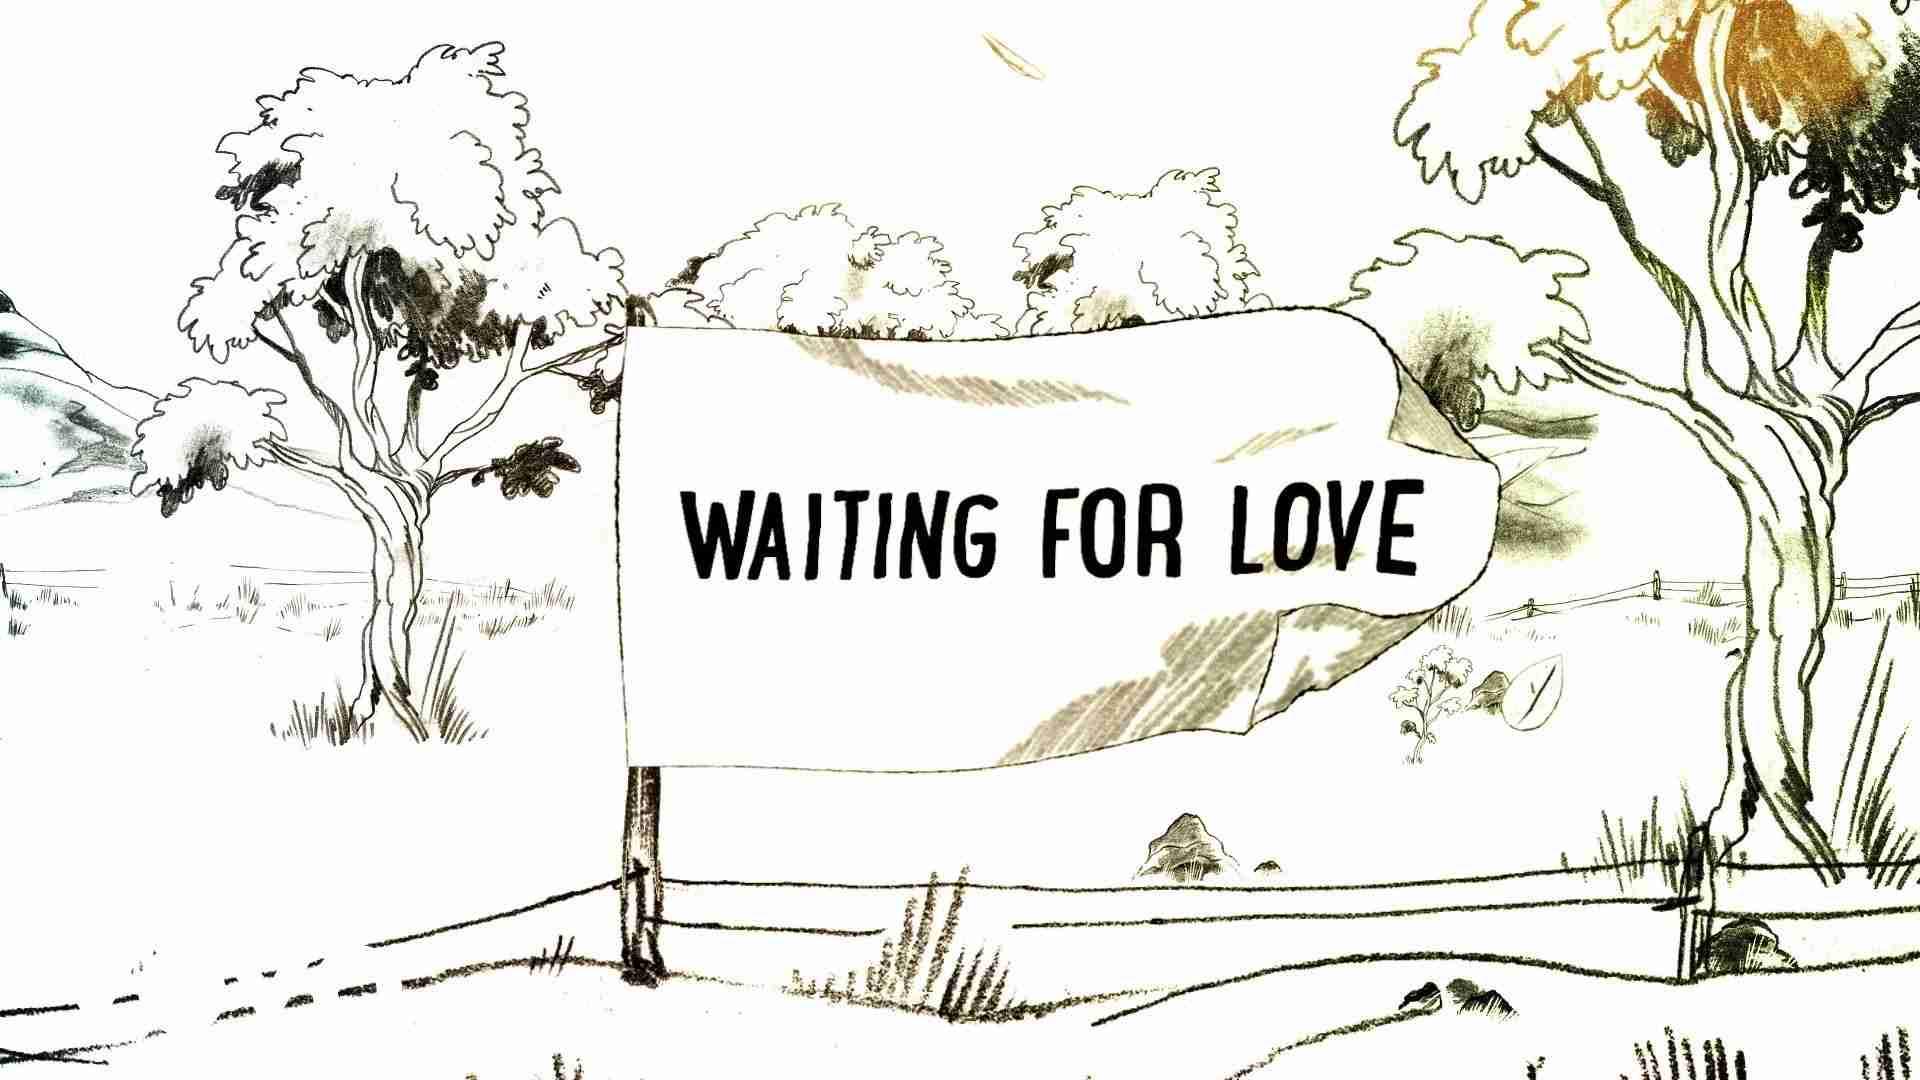 Avicii - Waiting For Love (Lyric Video) - YouTube